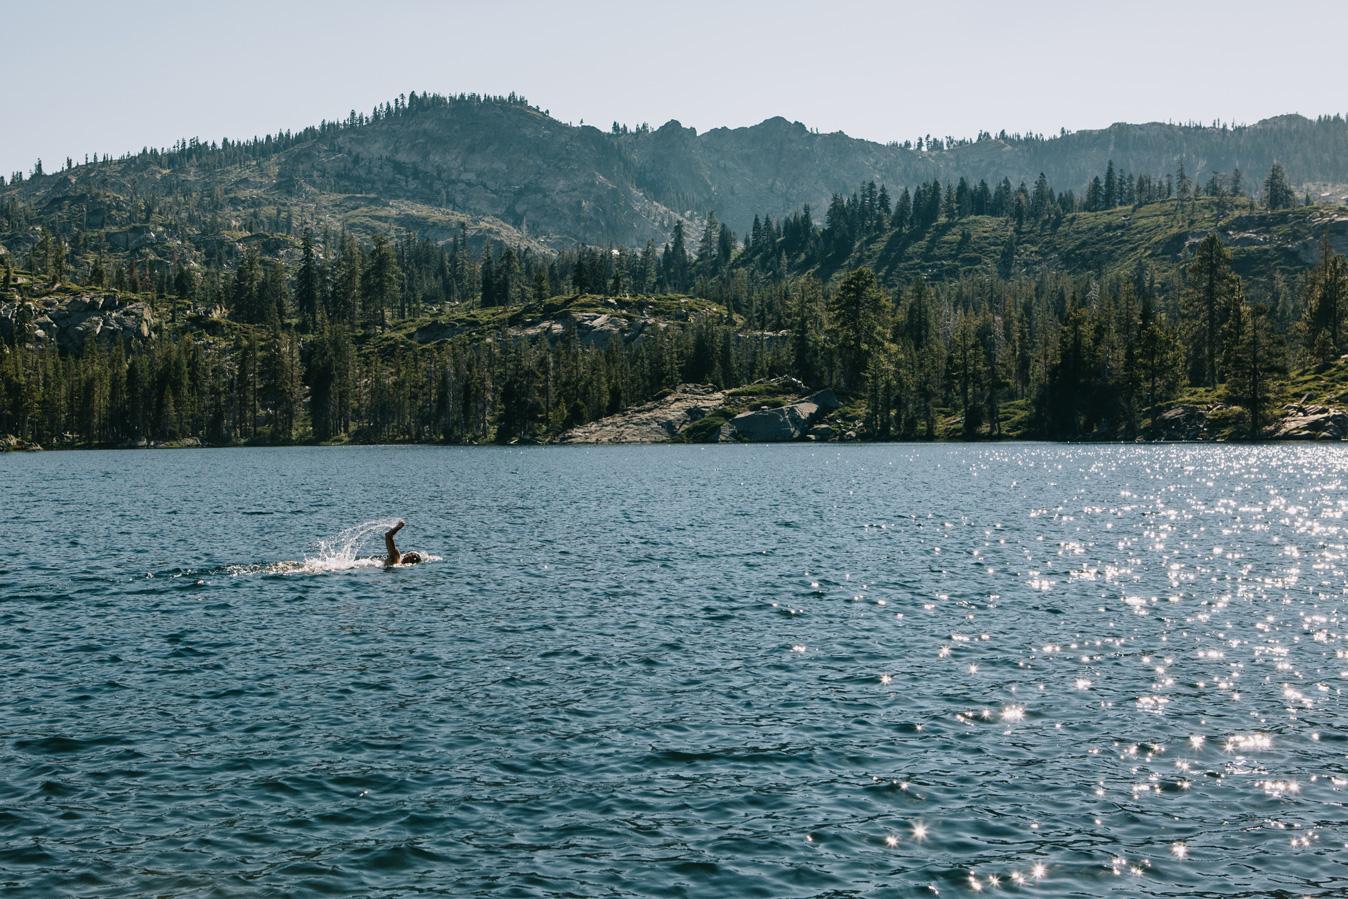 CindyGiovagnoli_outdoors_photographer_Sierra_Buttes_firetower_watchtower_Sardine_Snag_Bear_lake_hike_swim_camp-059.jpg